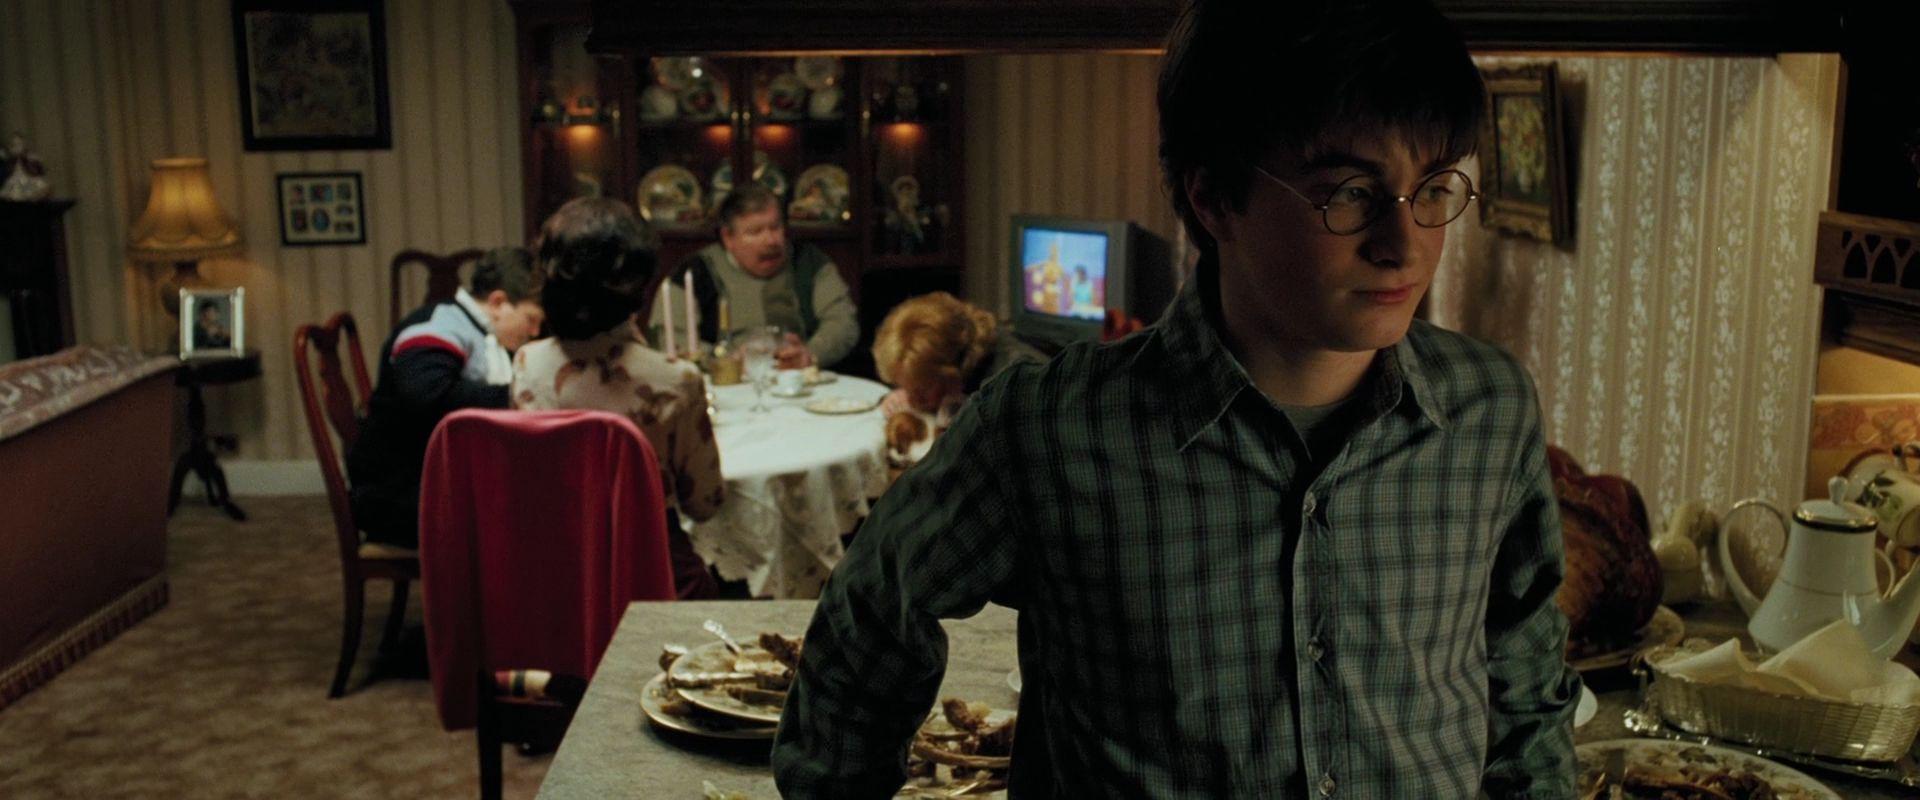 http://images4.fanpop.com/image/photos/17100000/Harry-Potter-And-The-Prisoner-Of-Azkaban-Blu-Ray-harry-potter-17165878-1920-800.jpg